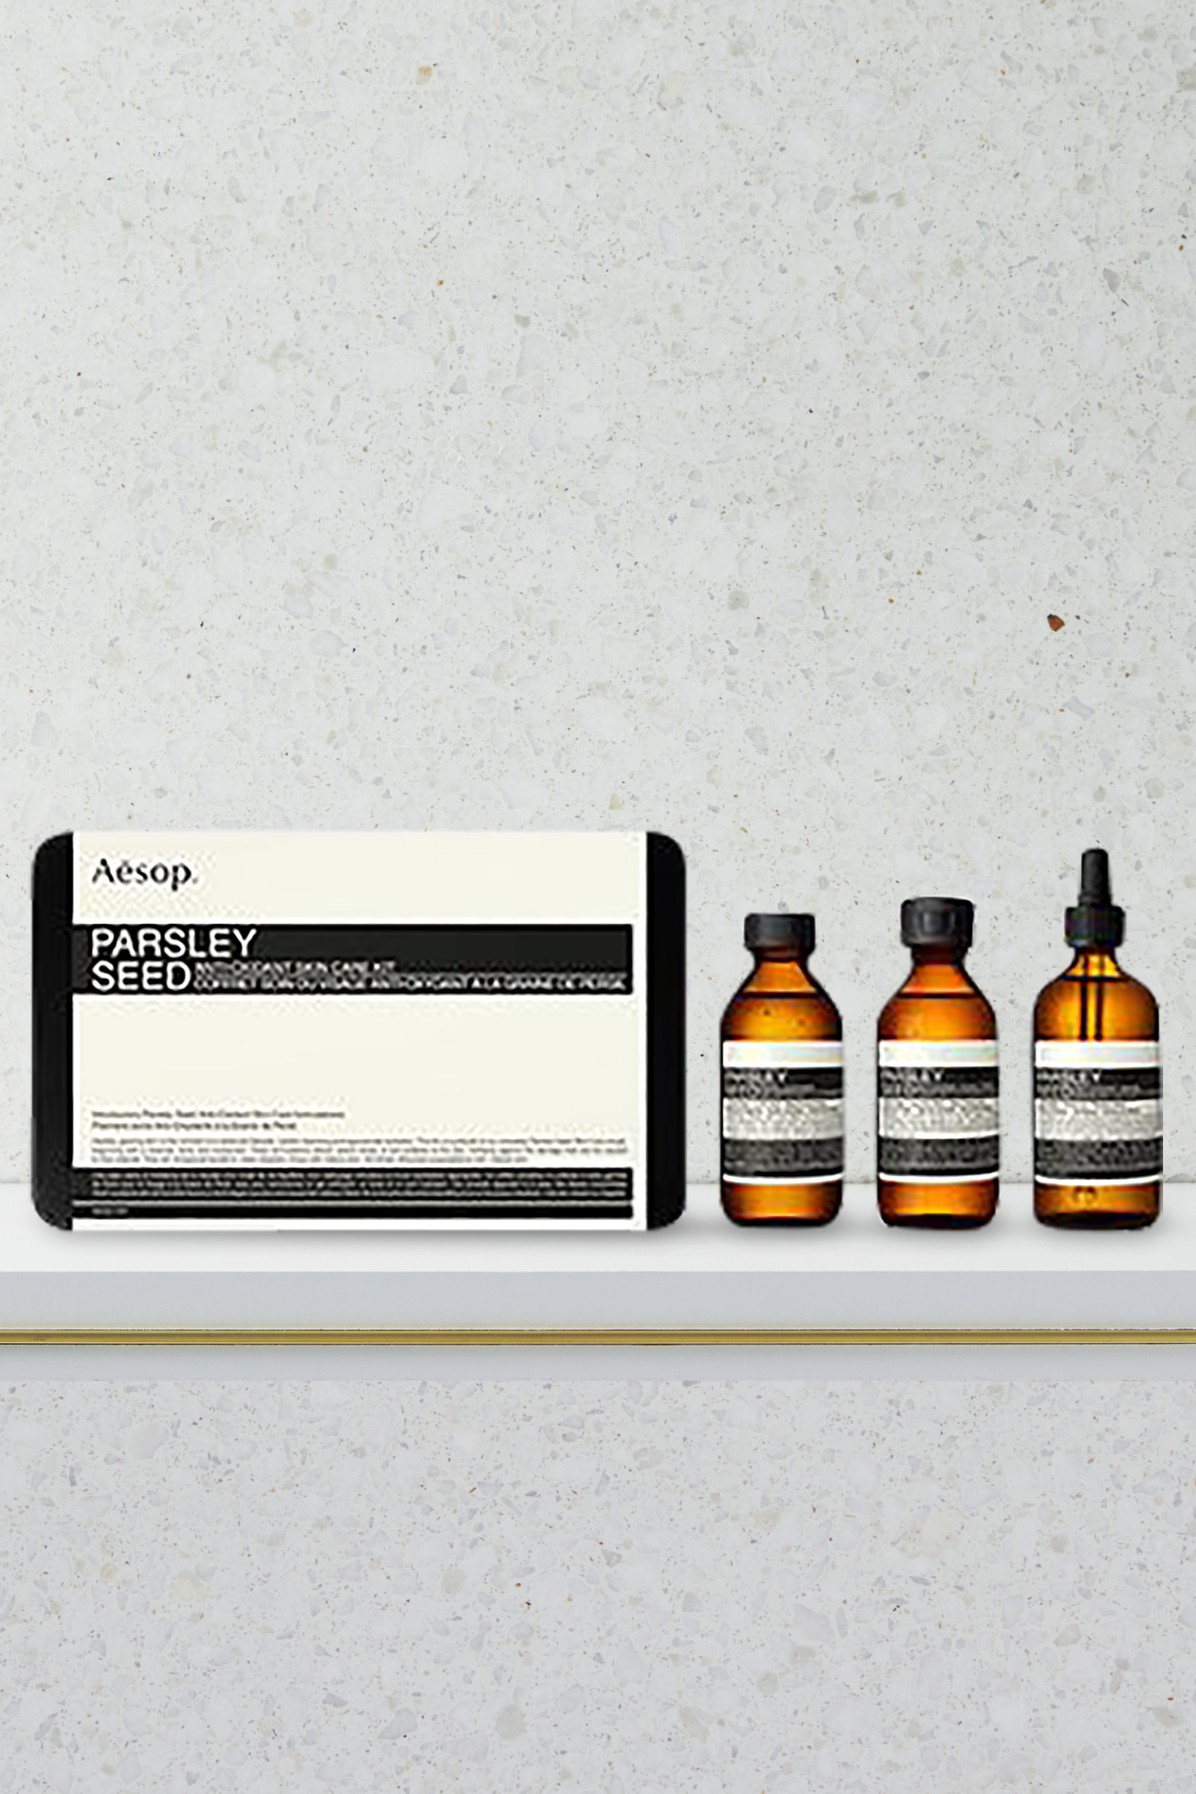 Aesop Parsley Seed Anti-Oxidant Skin Care Kit